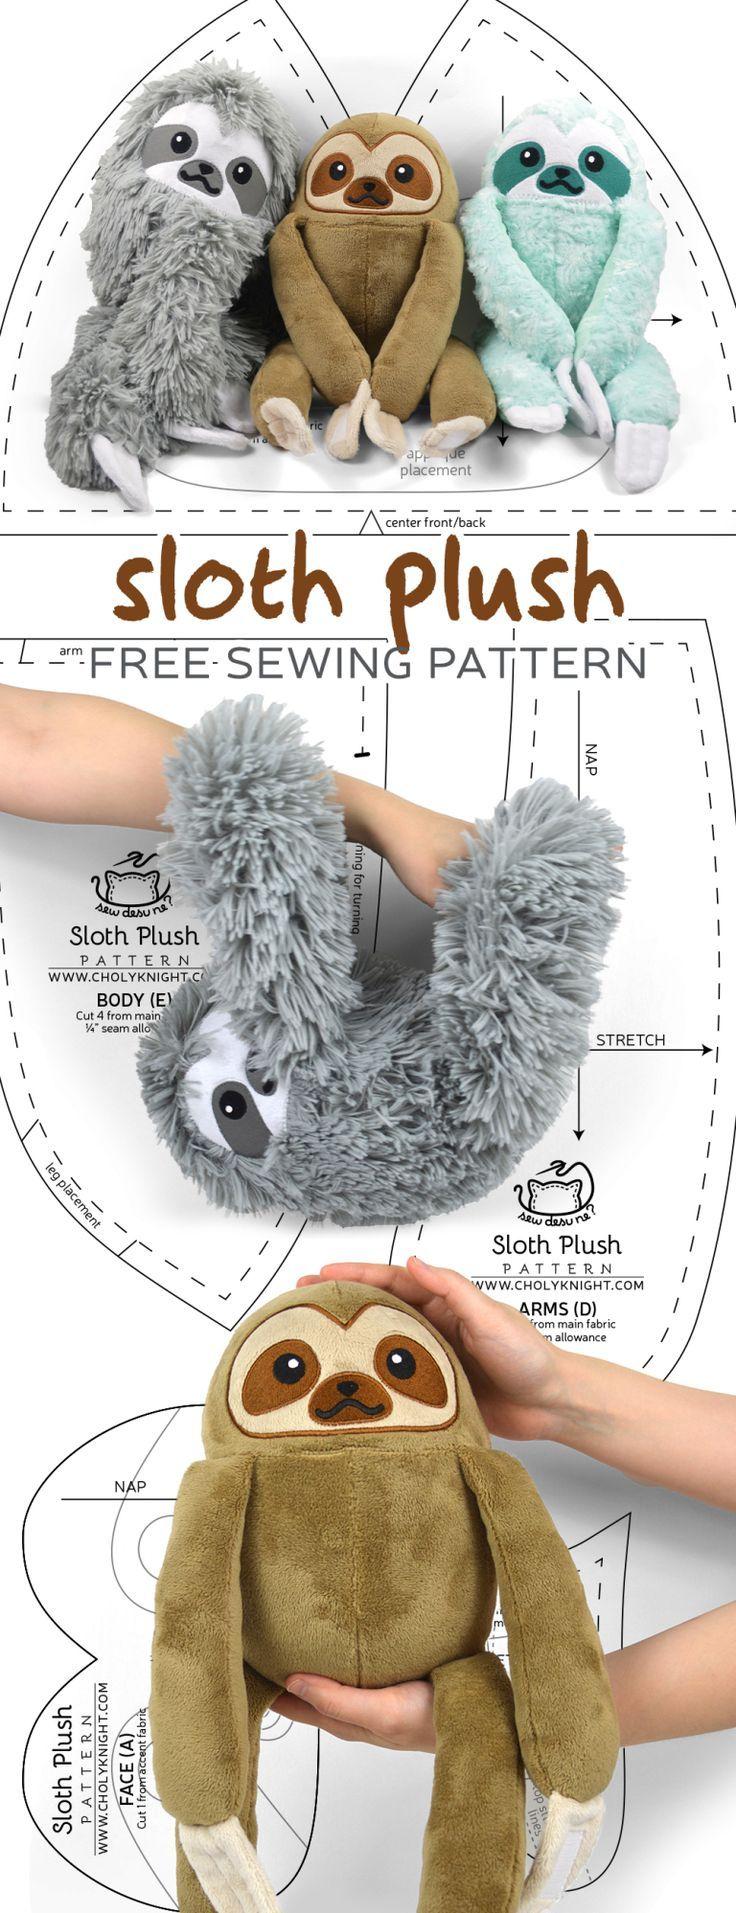 Free sample Friday! Sloth plush